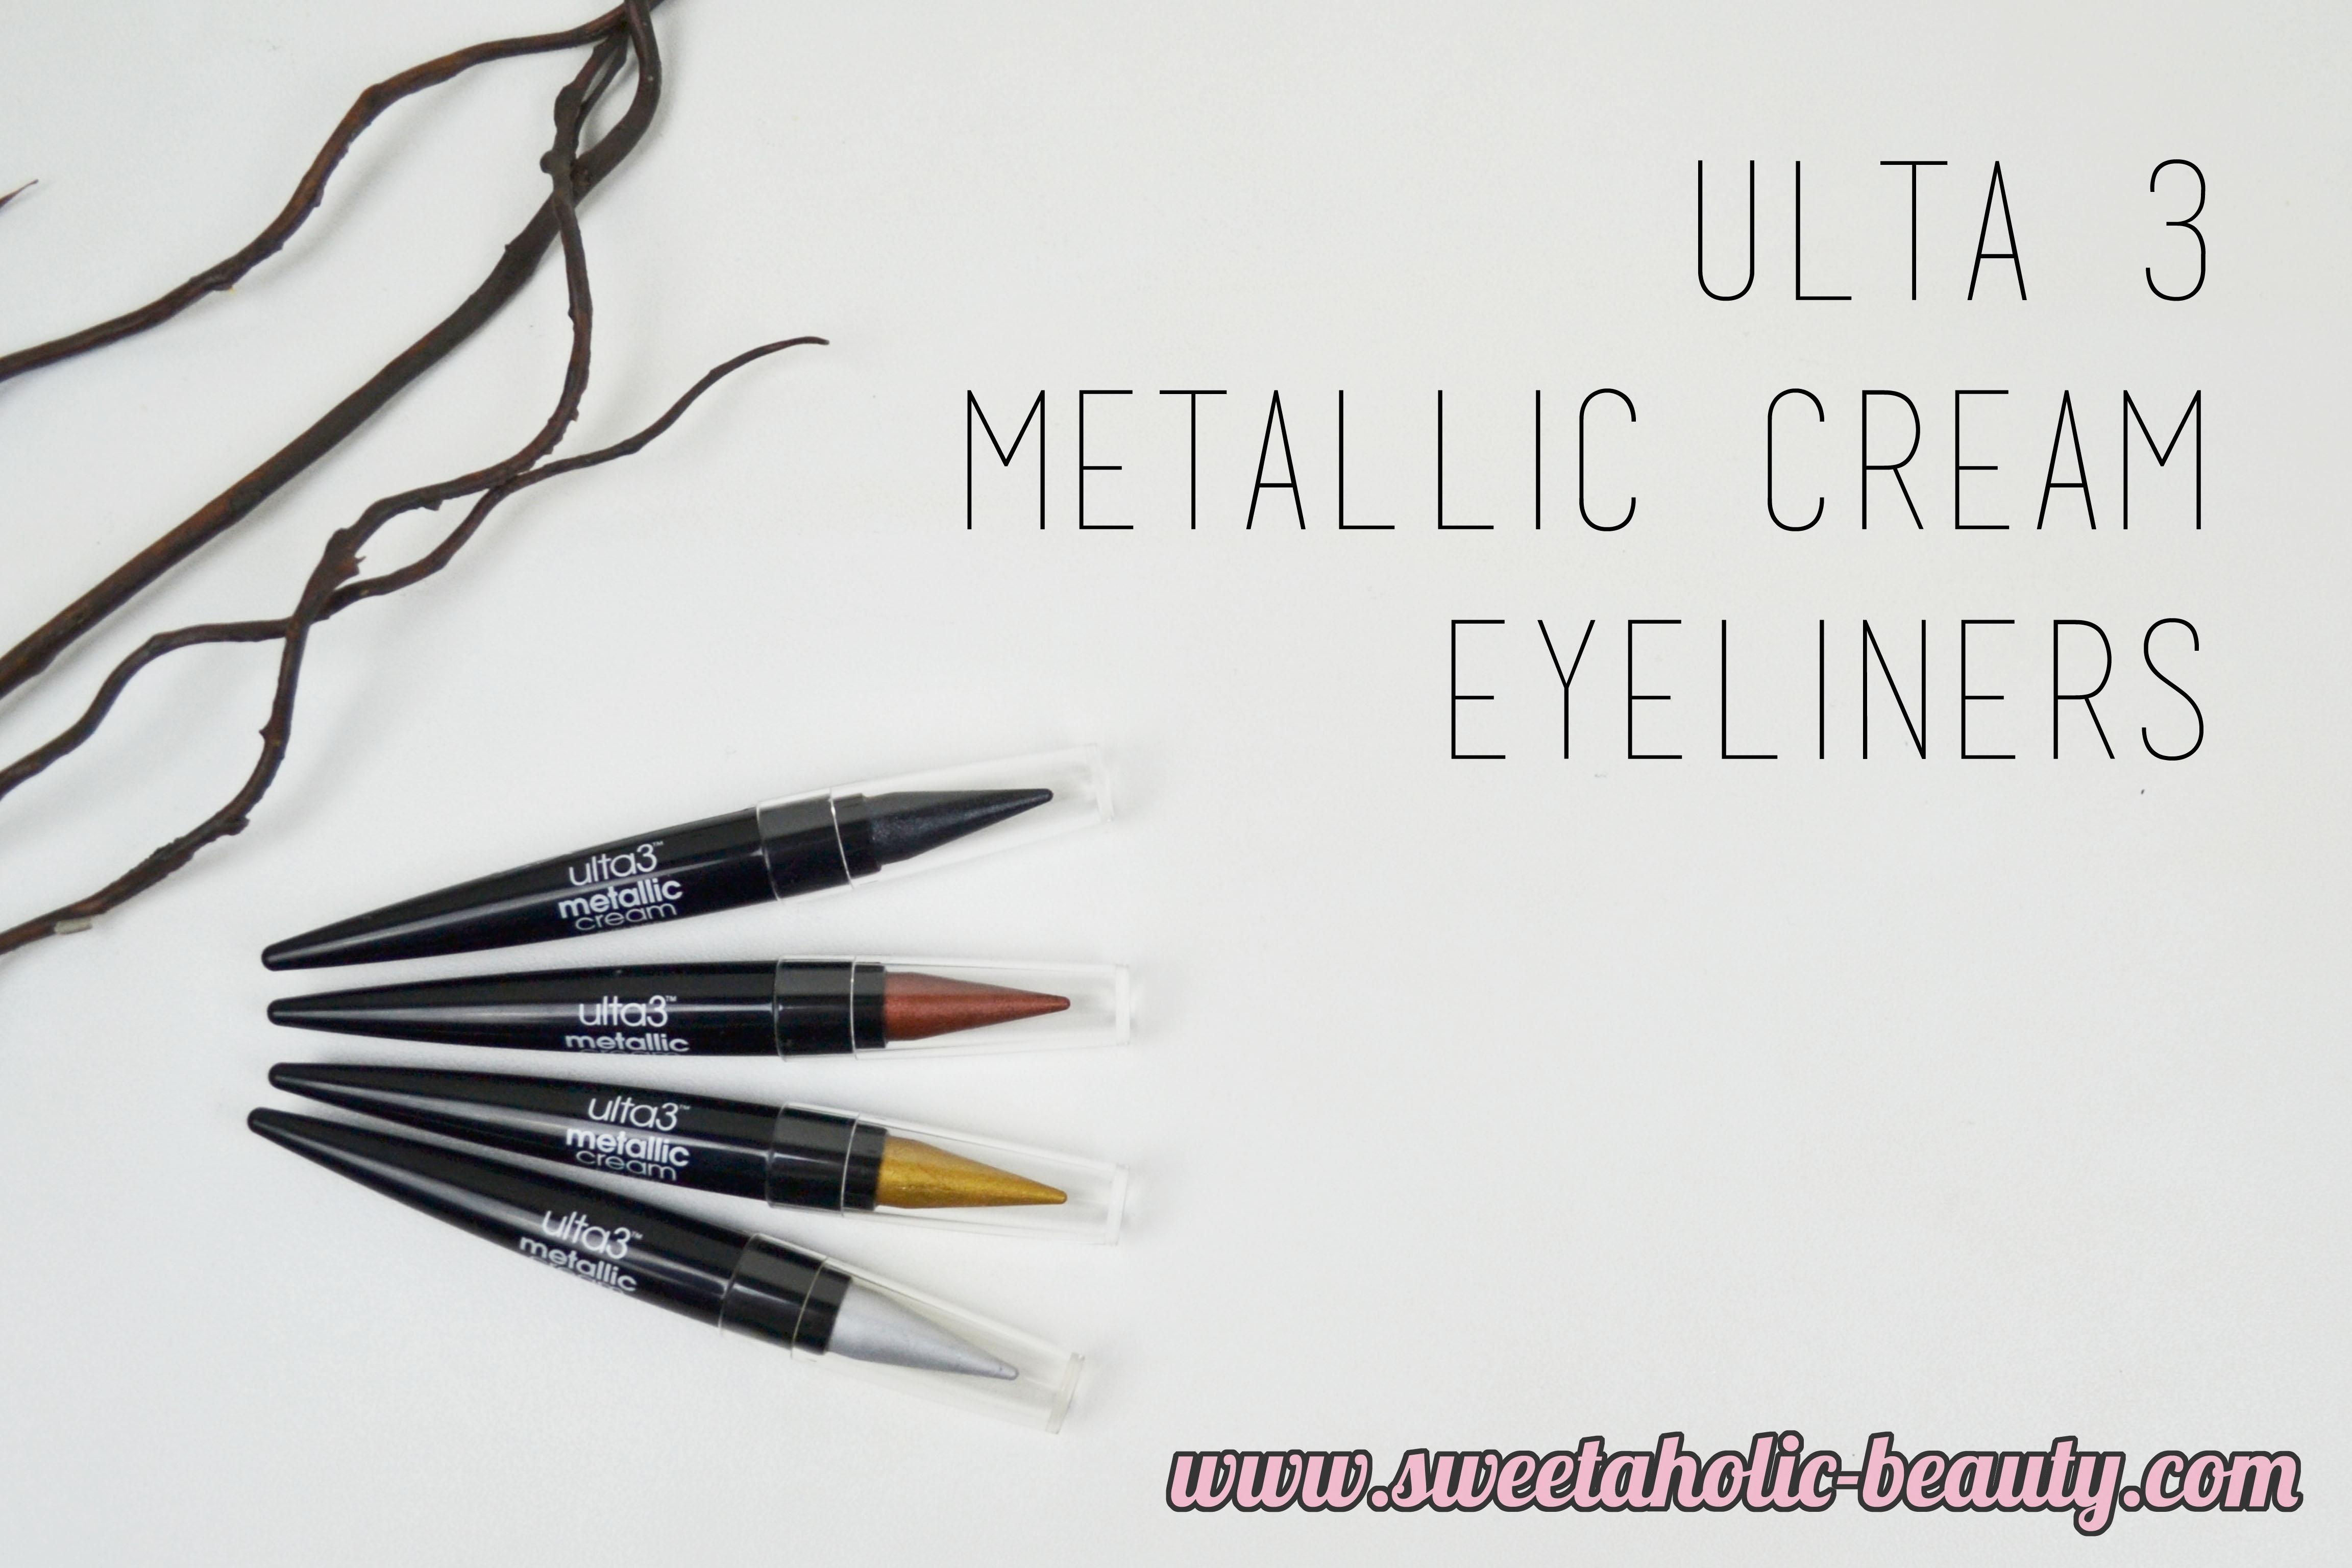 Ulta 3, Ulta 3 Metallic Cream Eyeliners, Australian, Bbloggers